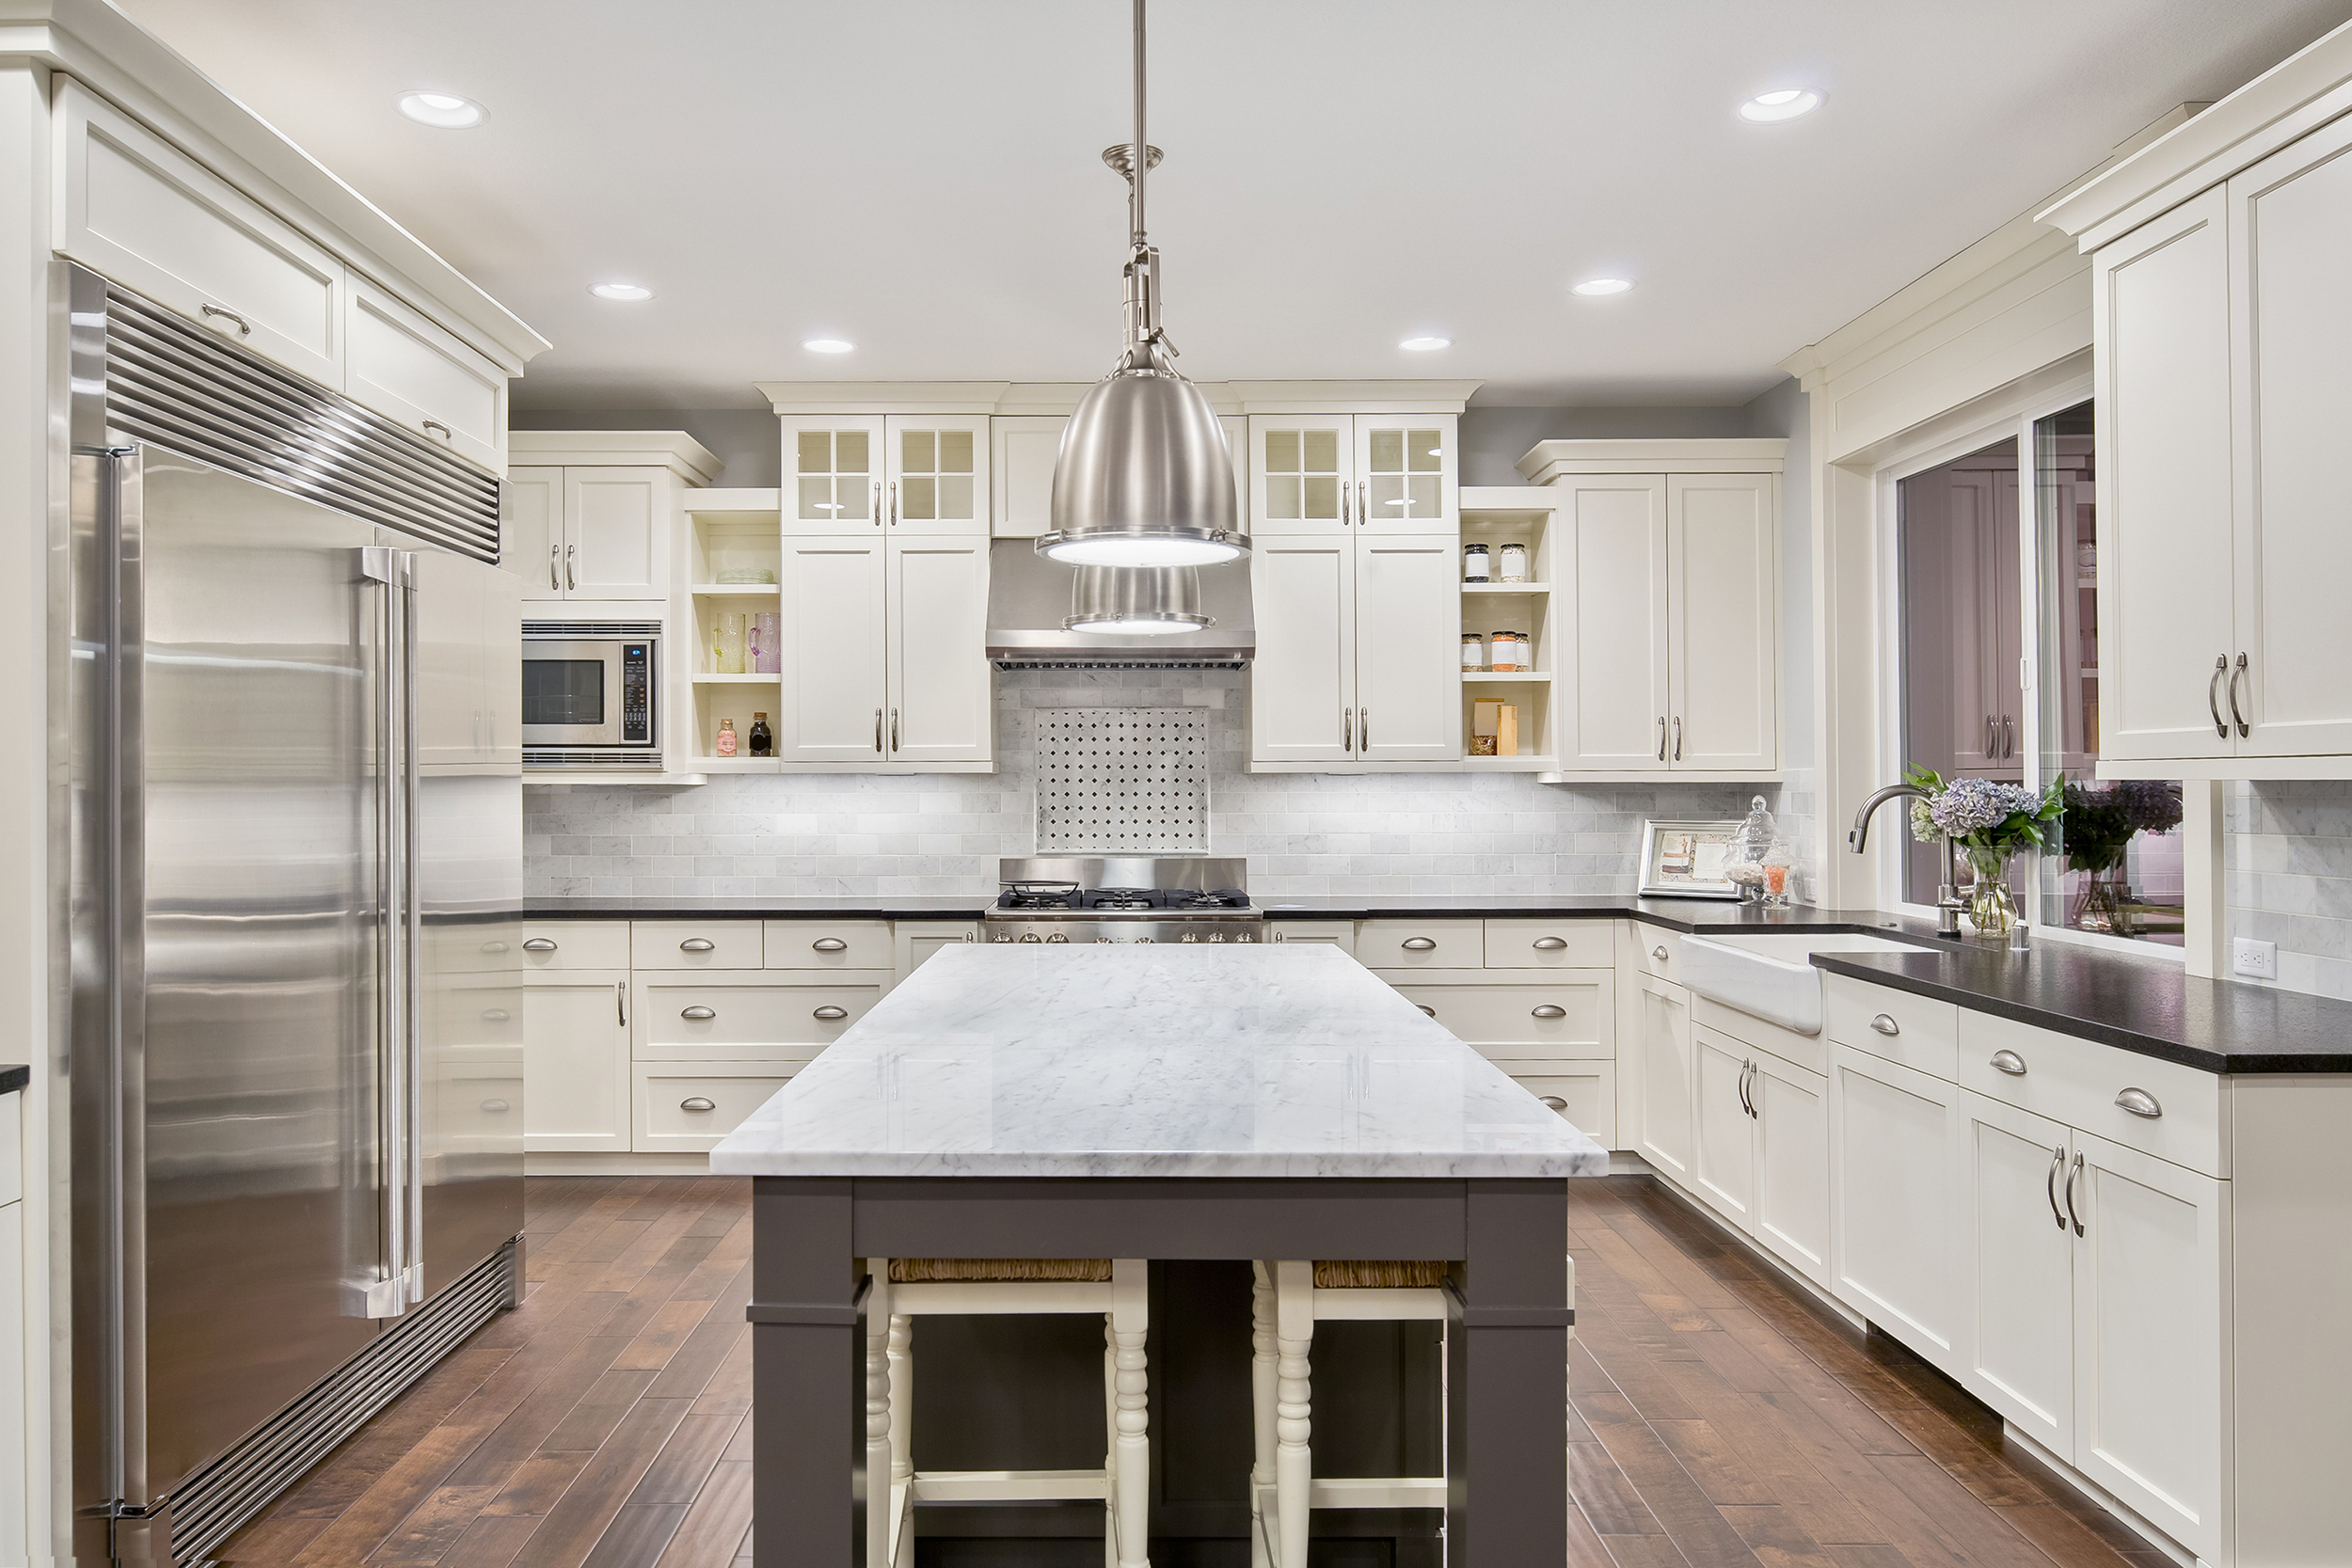 New Kitchen Cabinets 2016 kitchen cabinets in walnut creek ca | century cabinets